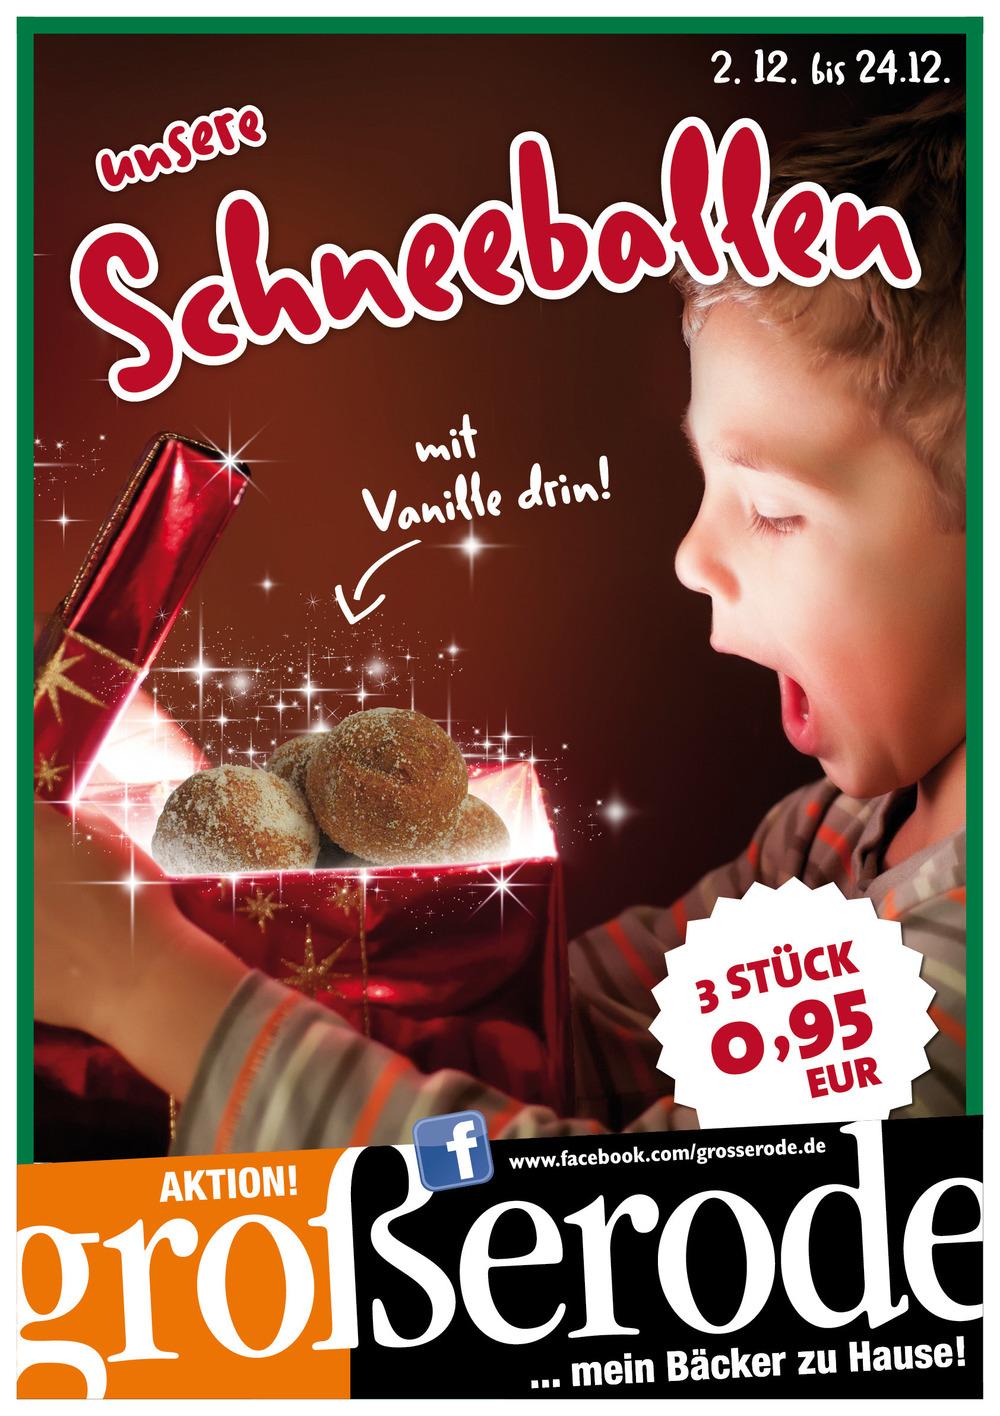 20131105_Grosserode_Weihnachten_Schneeball_web.jpg